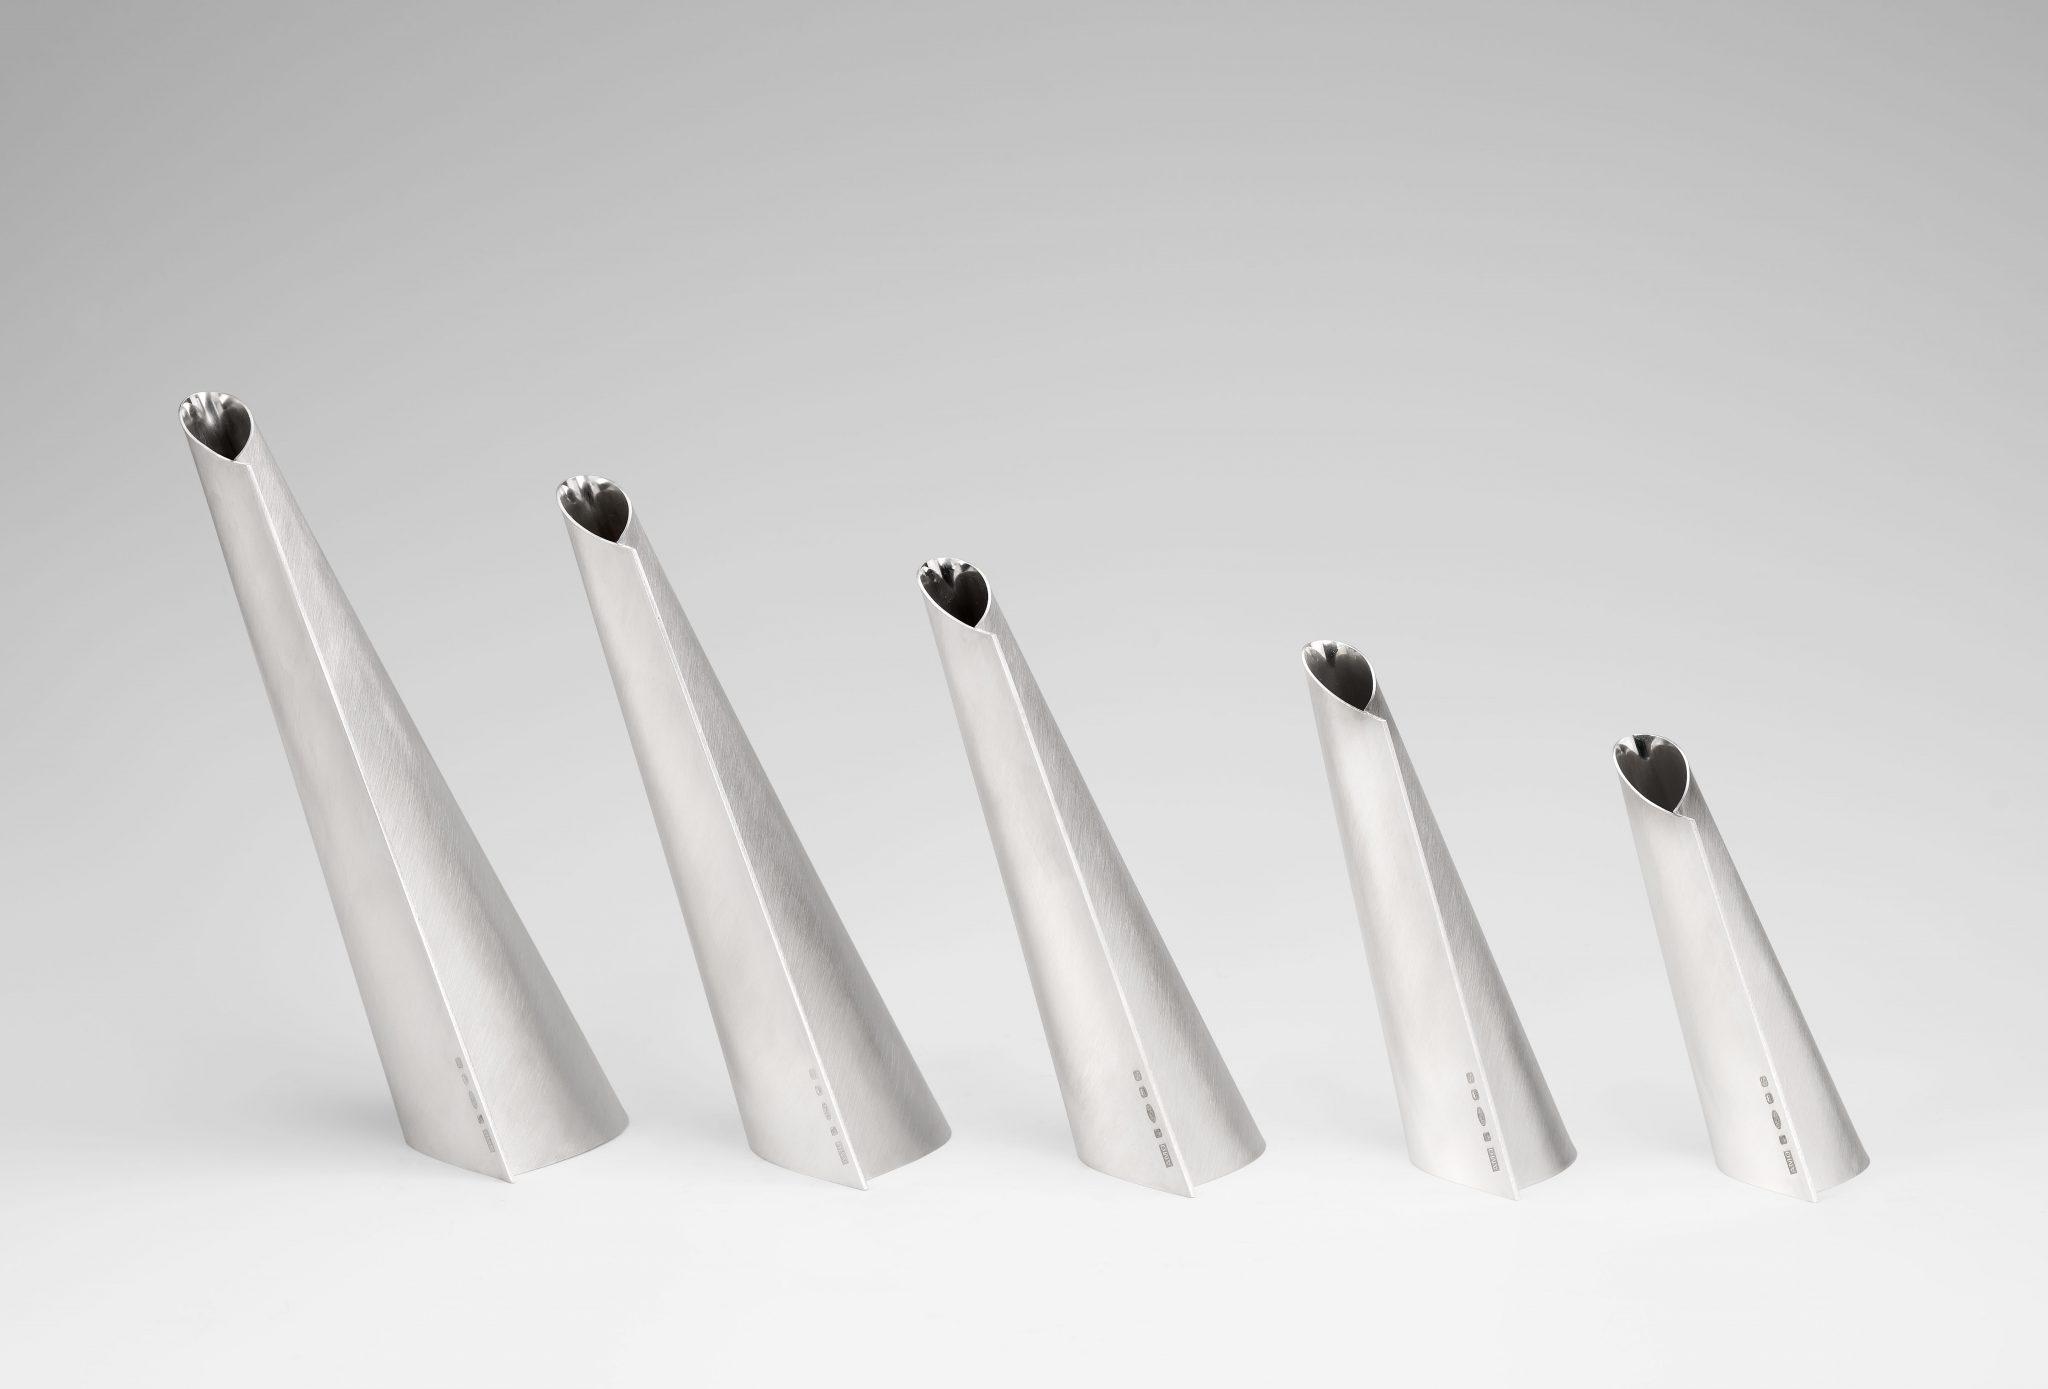 Veer series of five vessels, Britannia silver, 2017, 28cm x 40cm x 8cm